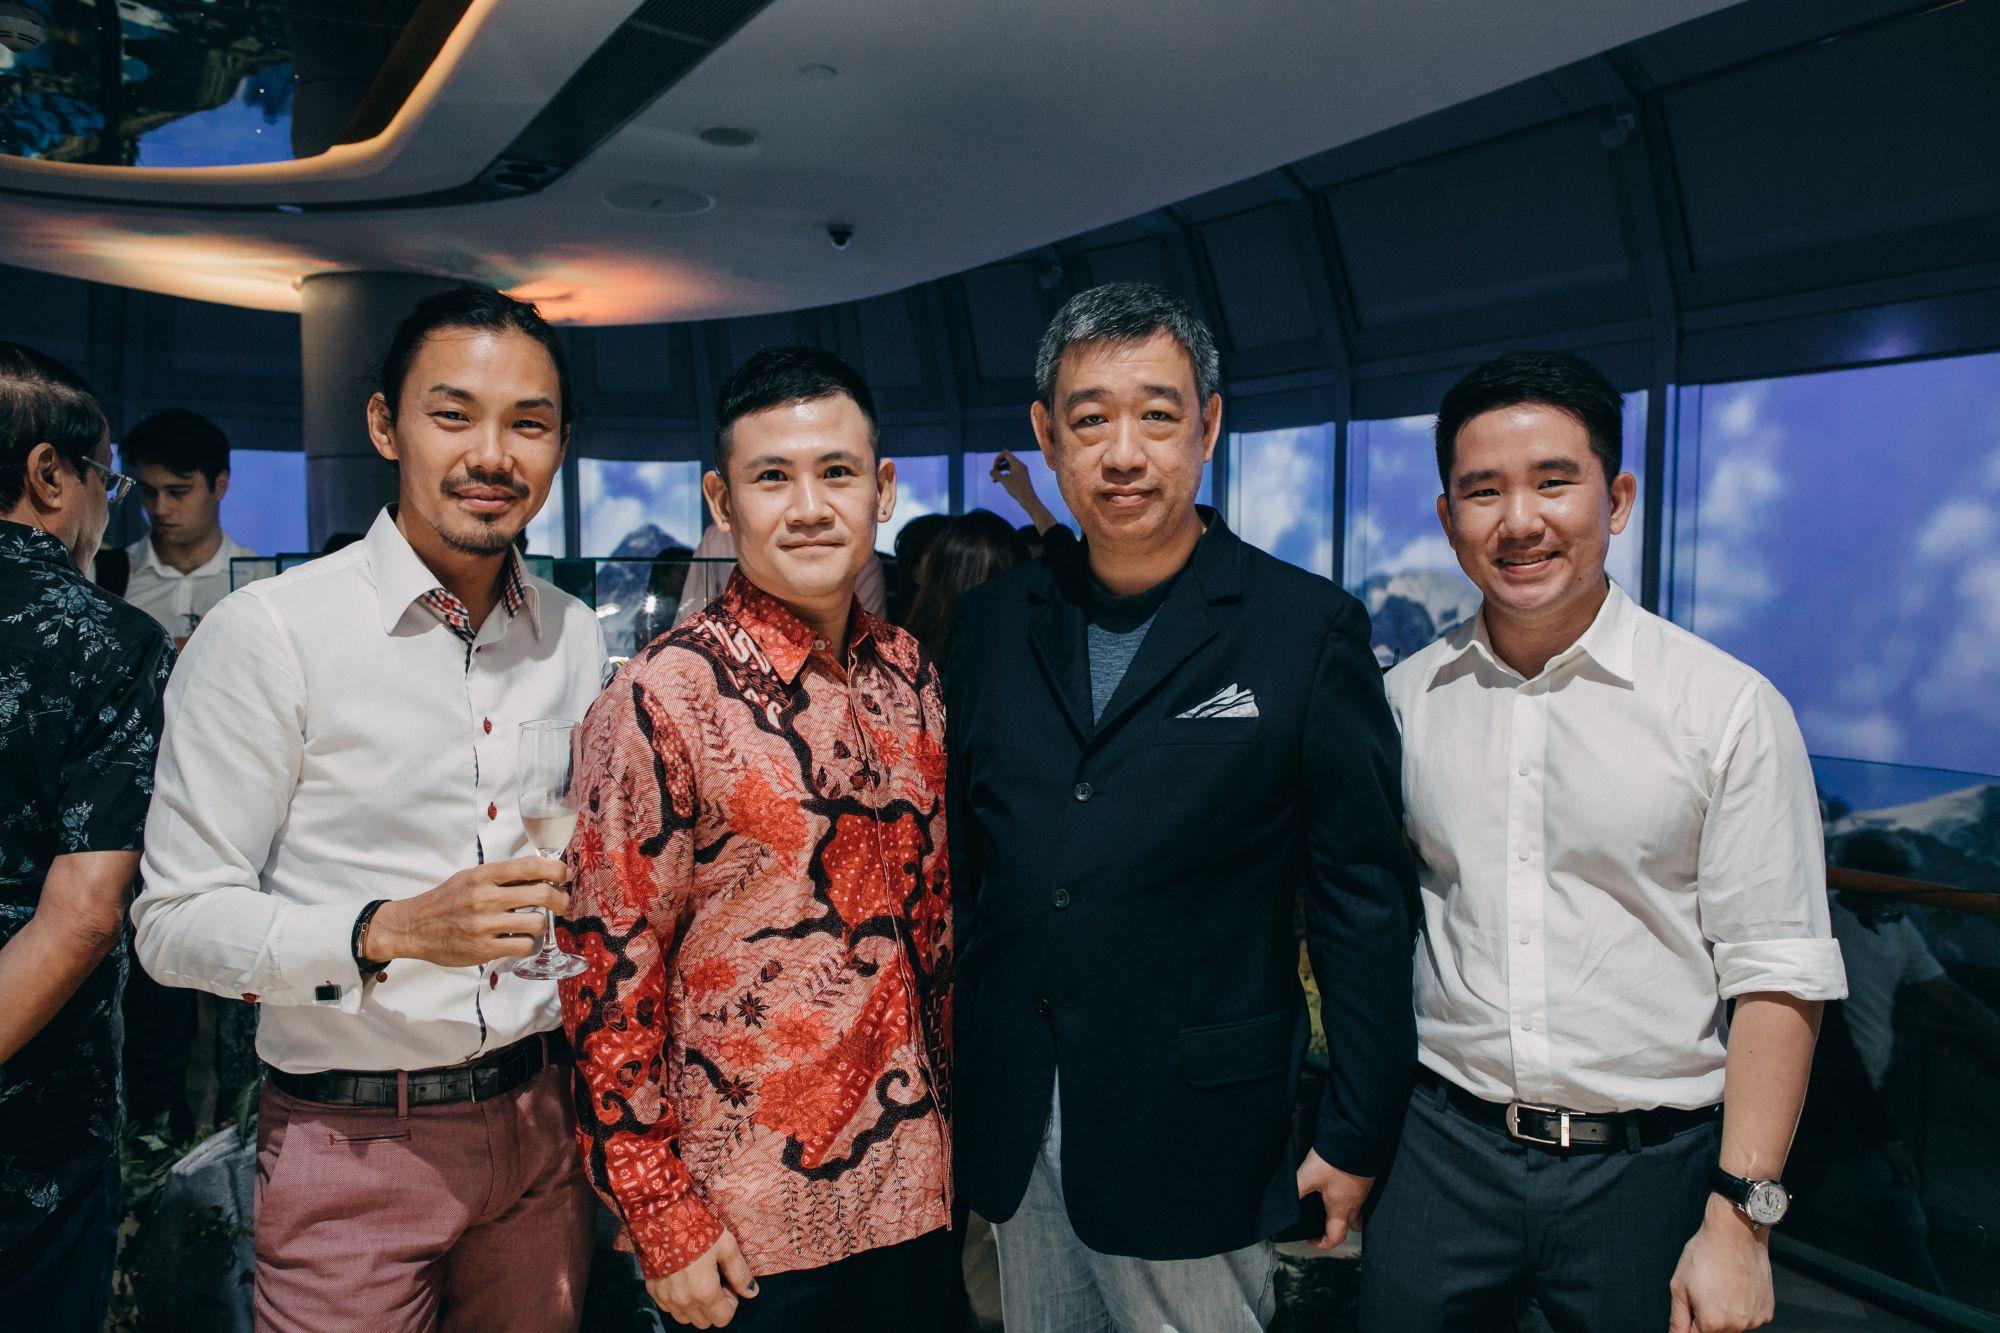 Mike Yuen, Andy Chua, Willis Liu, Simon Neo